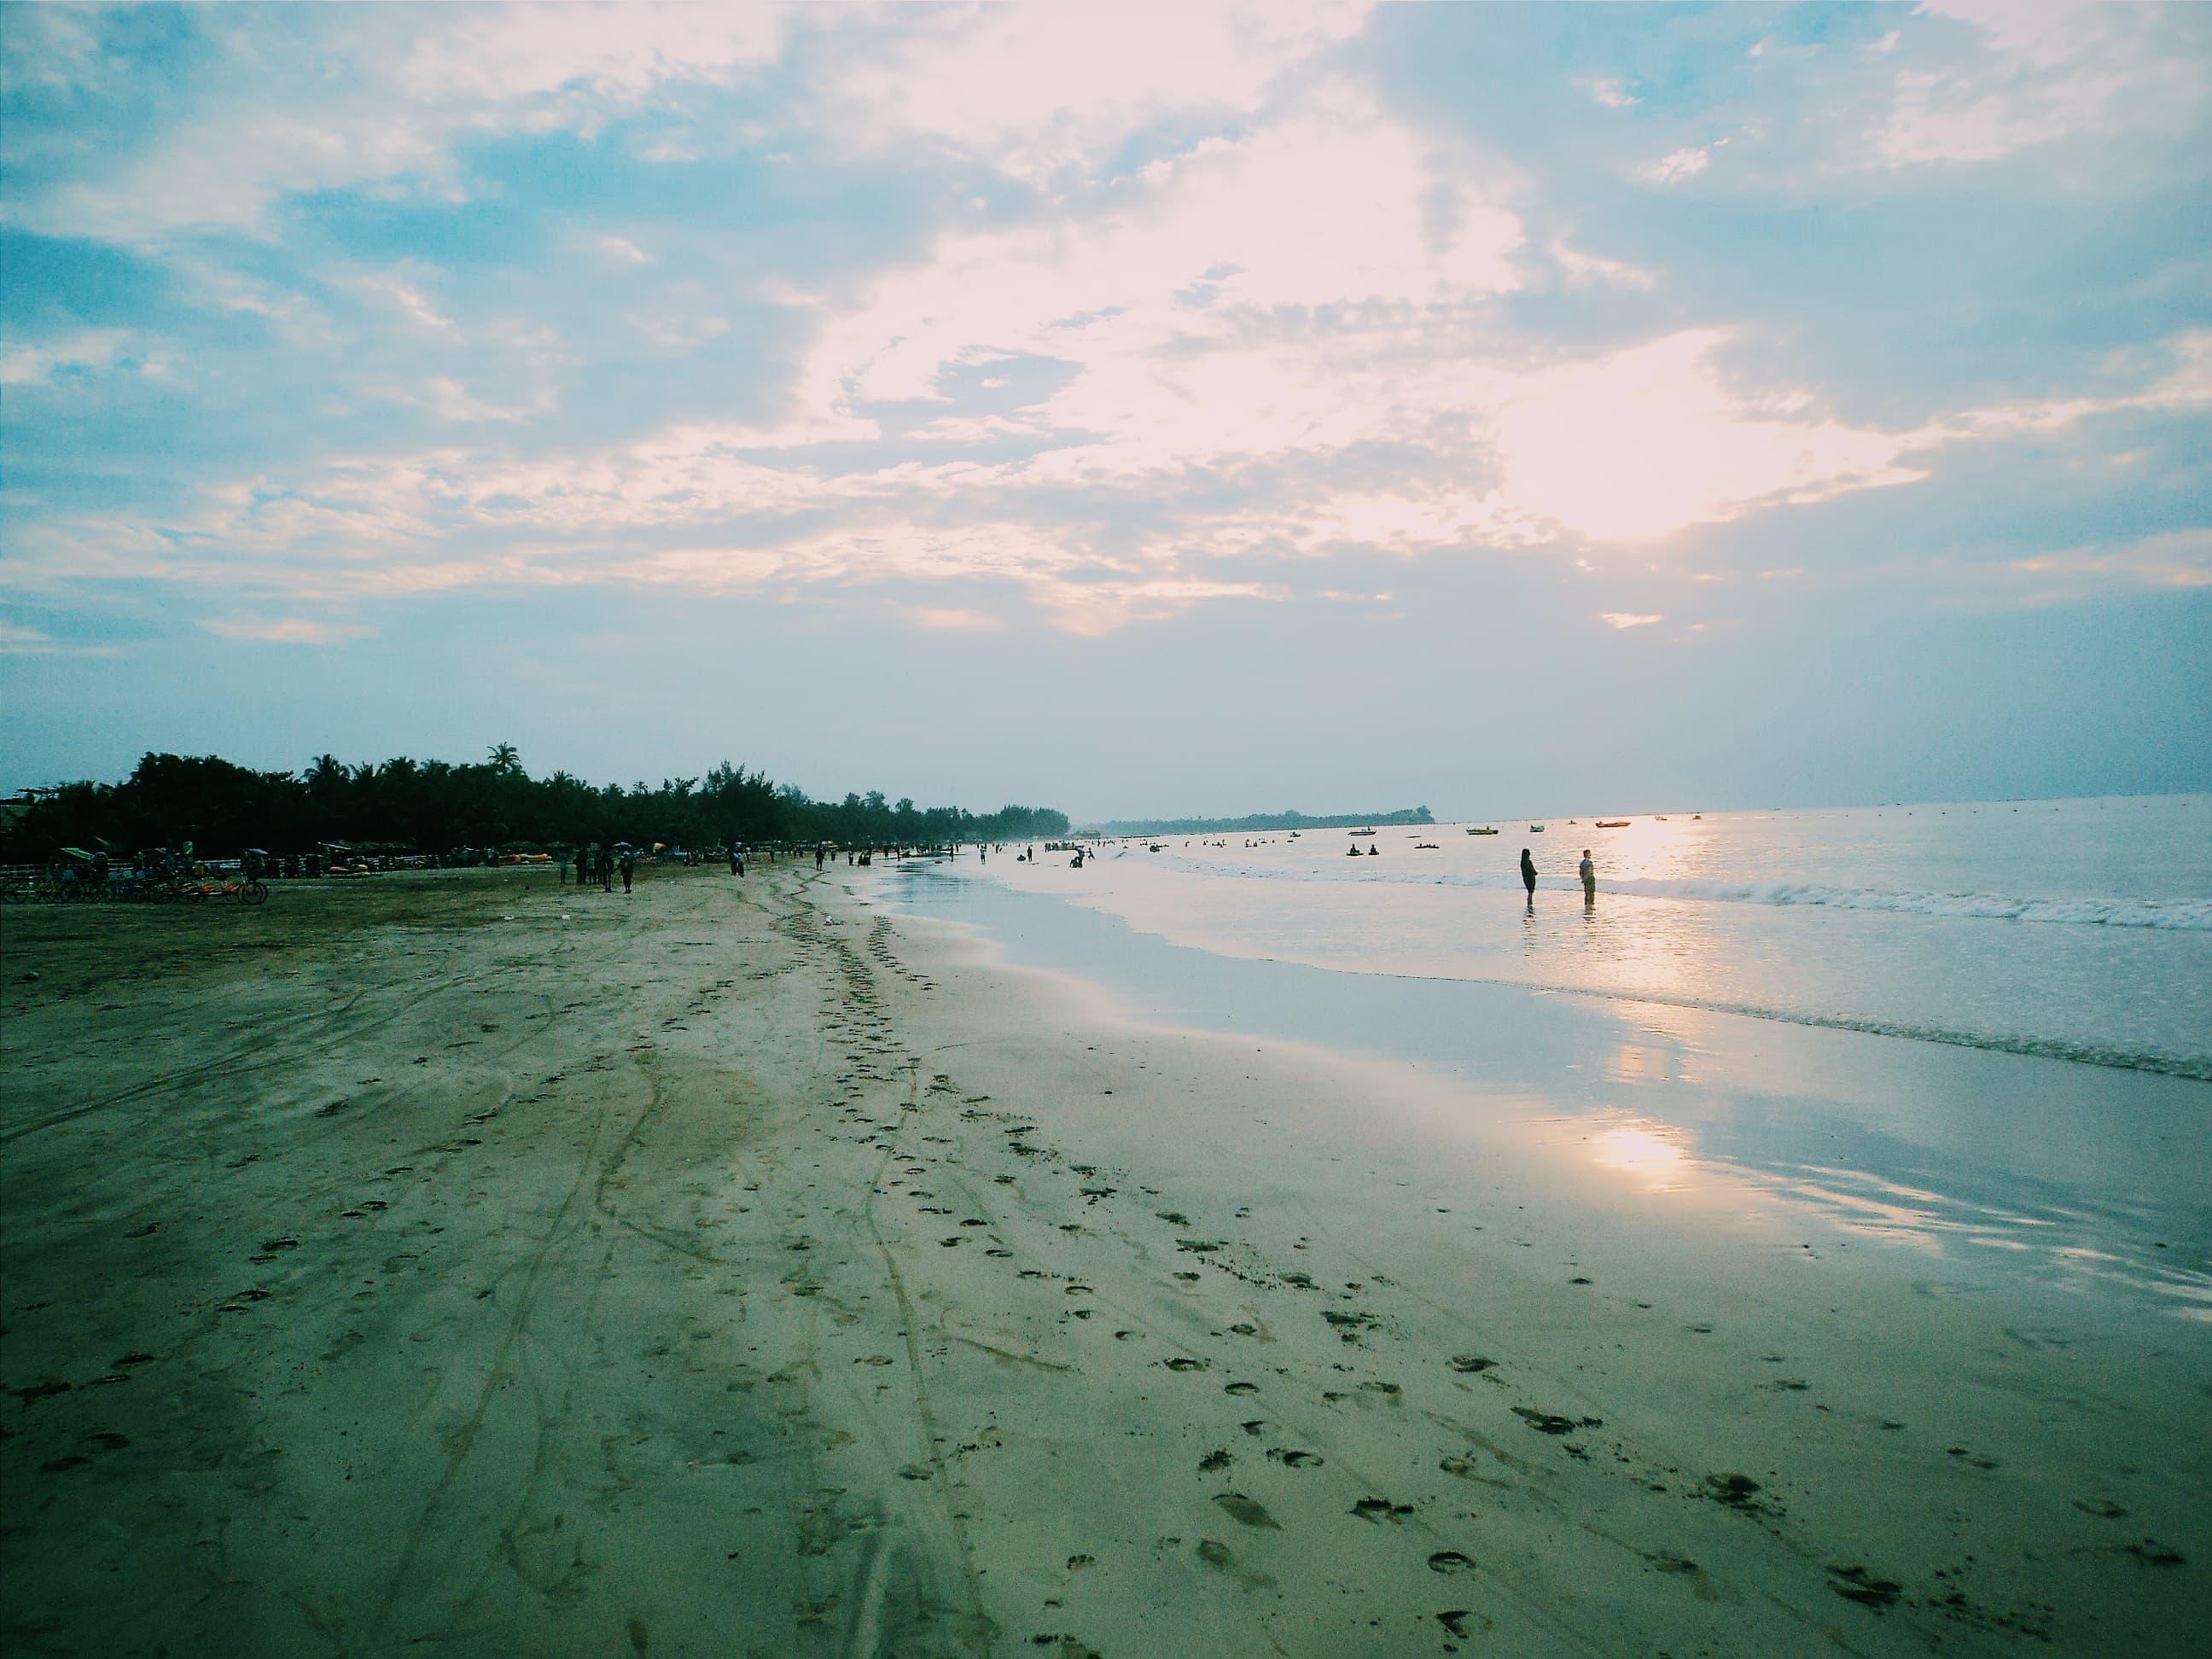 Chaungtha Beach. Travel Myanmar in a low budget